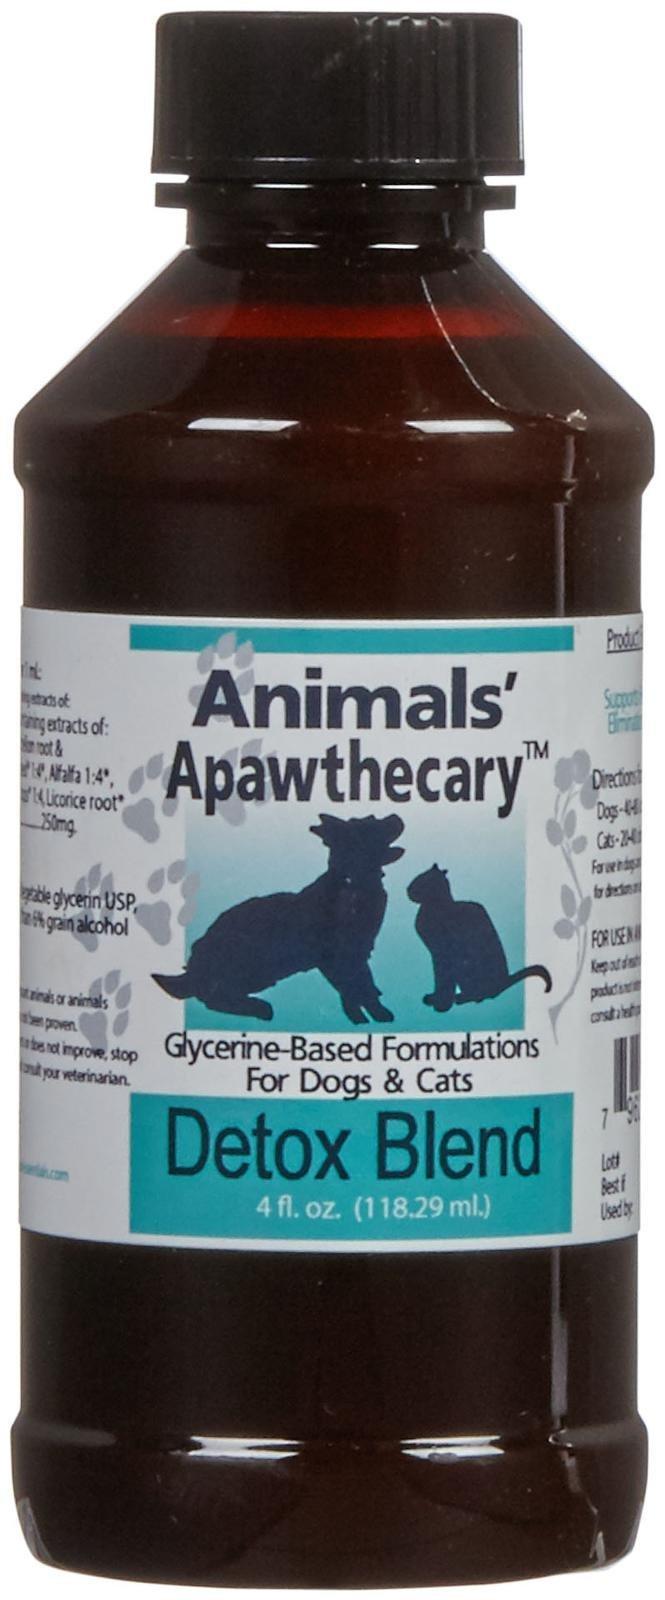 Animal Essentials Apawthecary Detox Blend Supplement, 4 oz